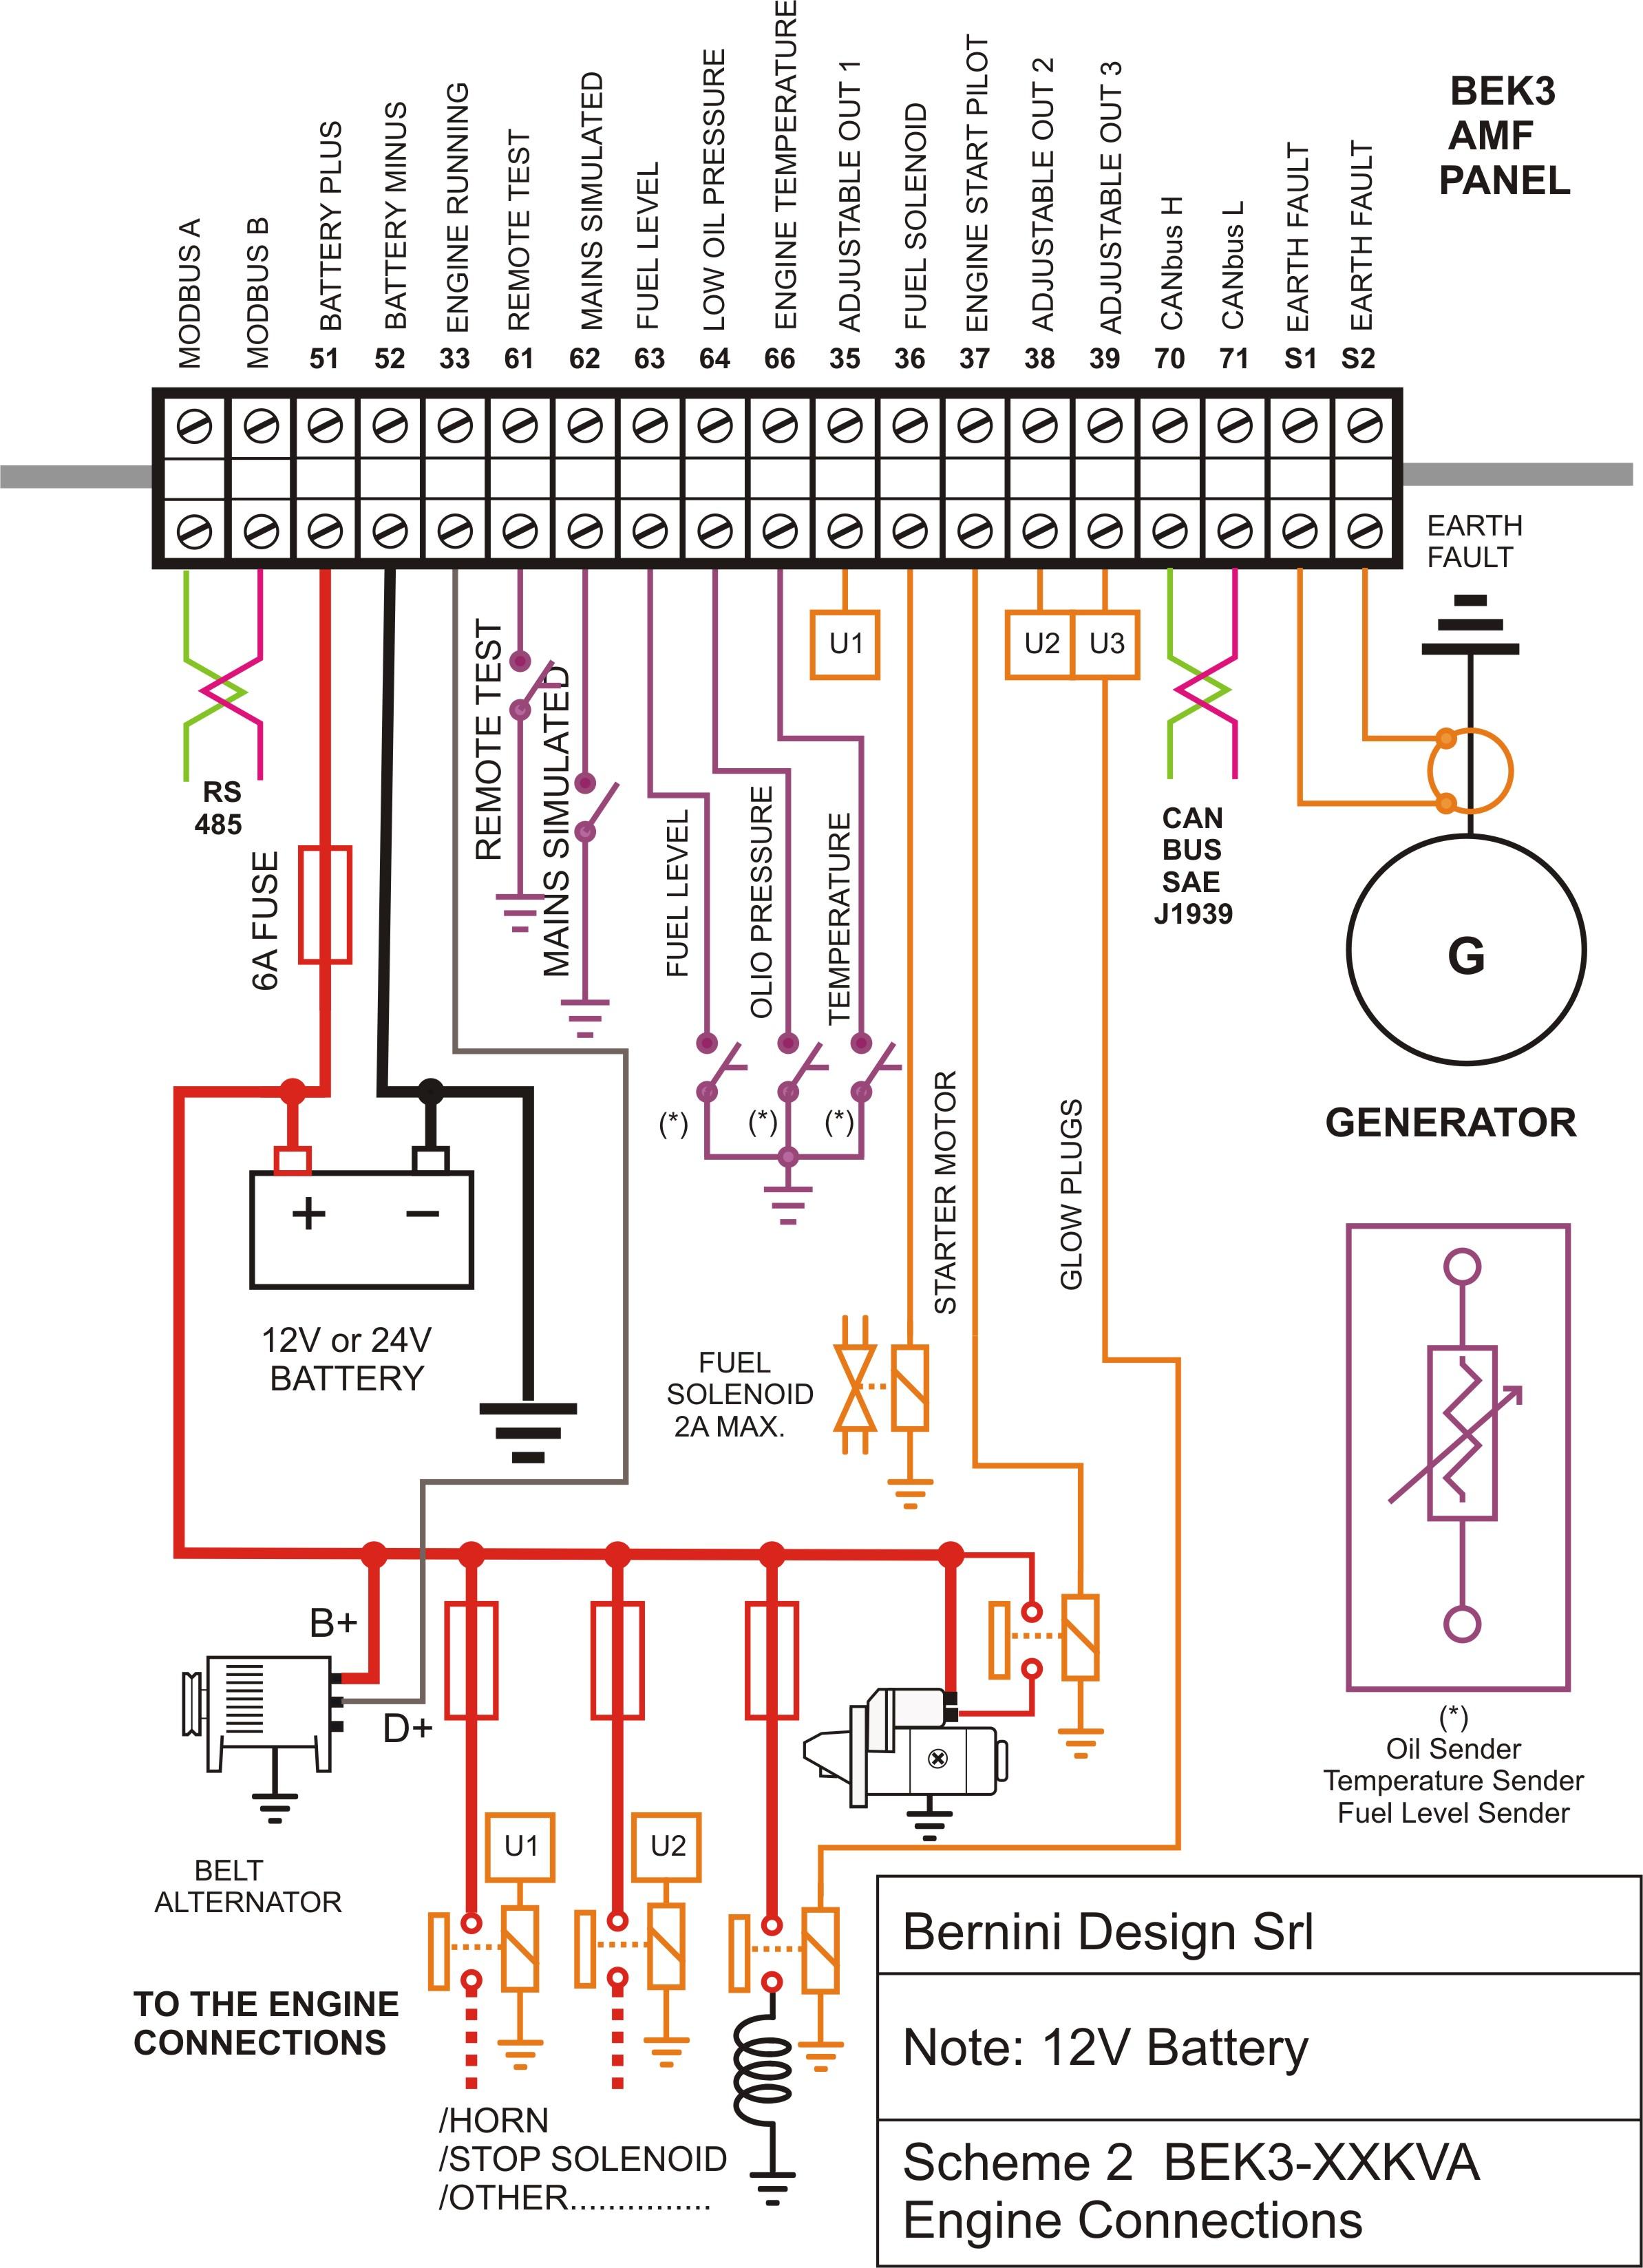 Breathtaking perkins jcb 214 wiring diagram contemporary best jcb 214 starter wiring diagram free download wiring diagrams swarovskicordoba Choice Image